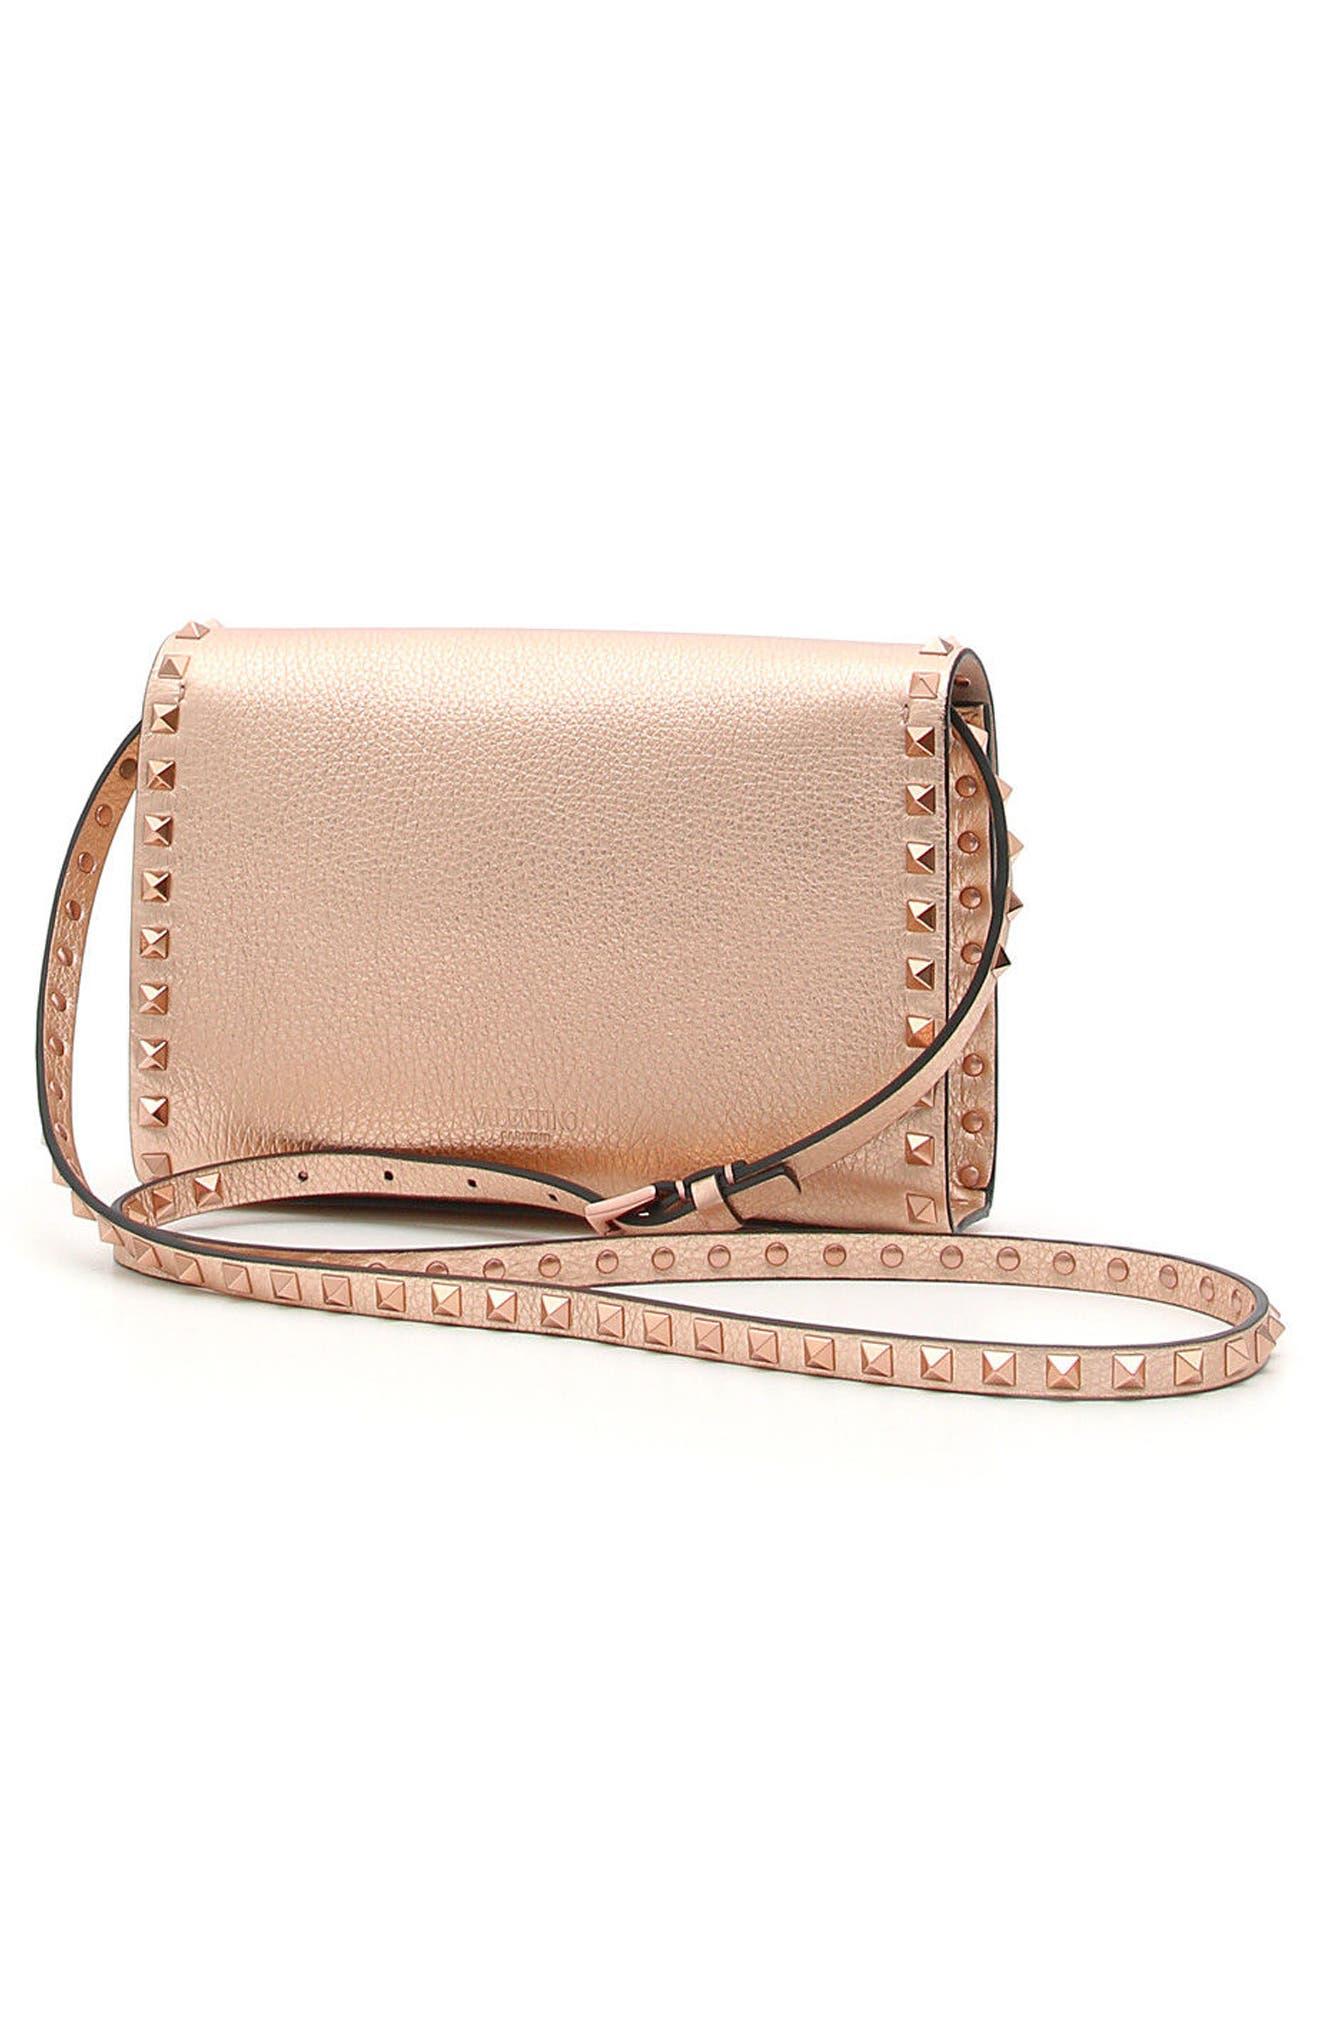 Rockstud Medium Metallic Leather Shoulder Bag,                             Alternate thumbnail 2, color,                             682